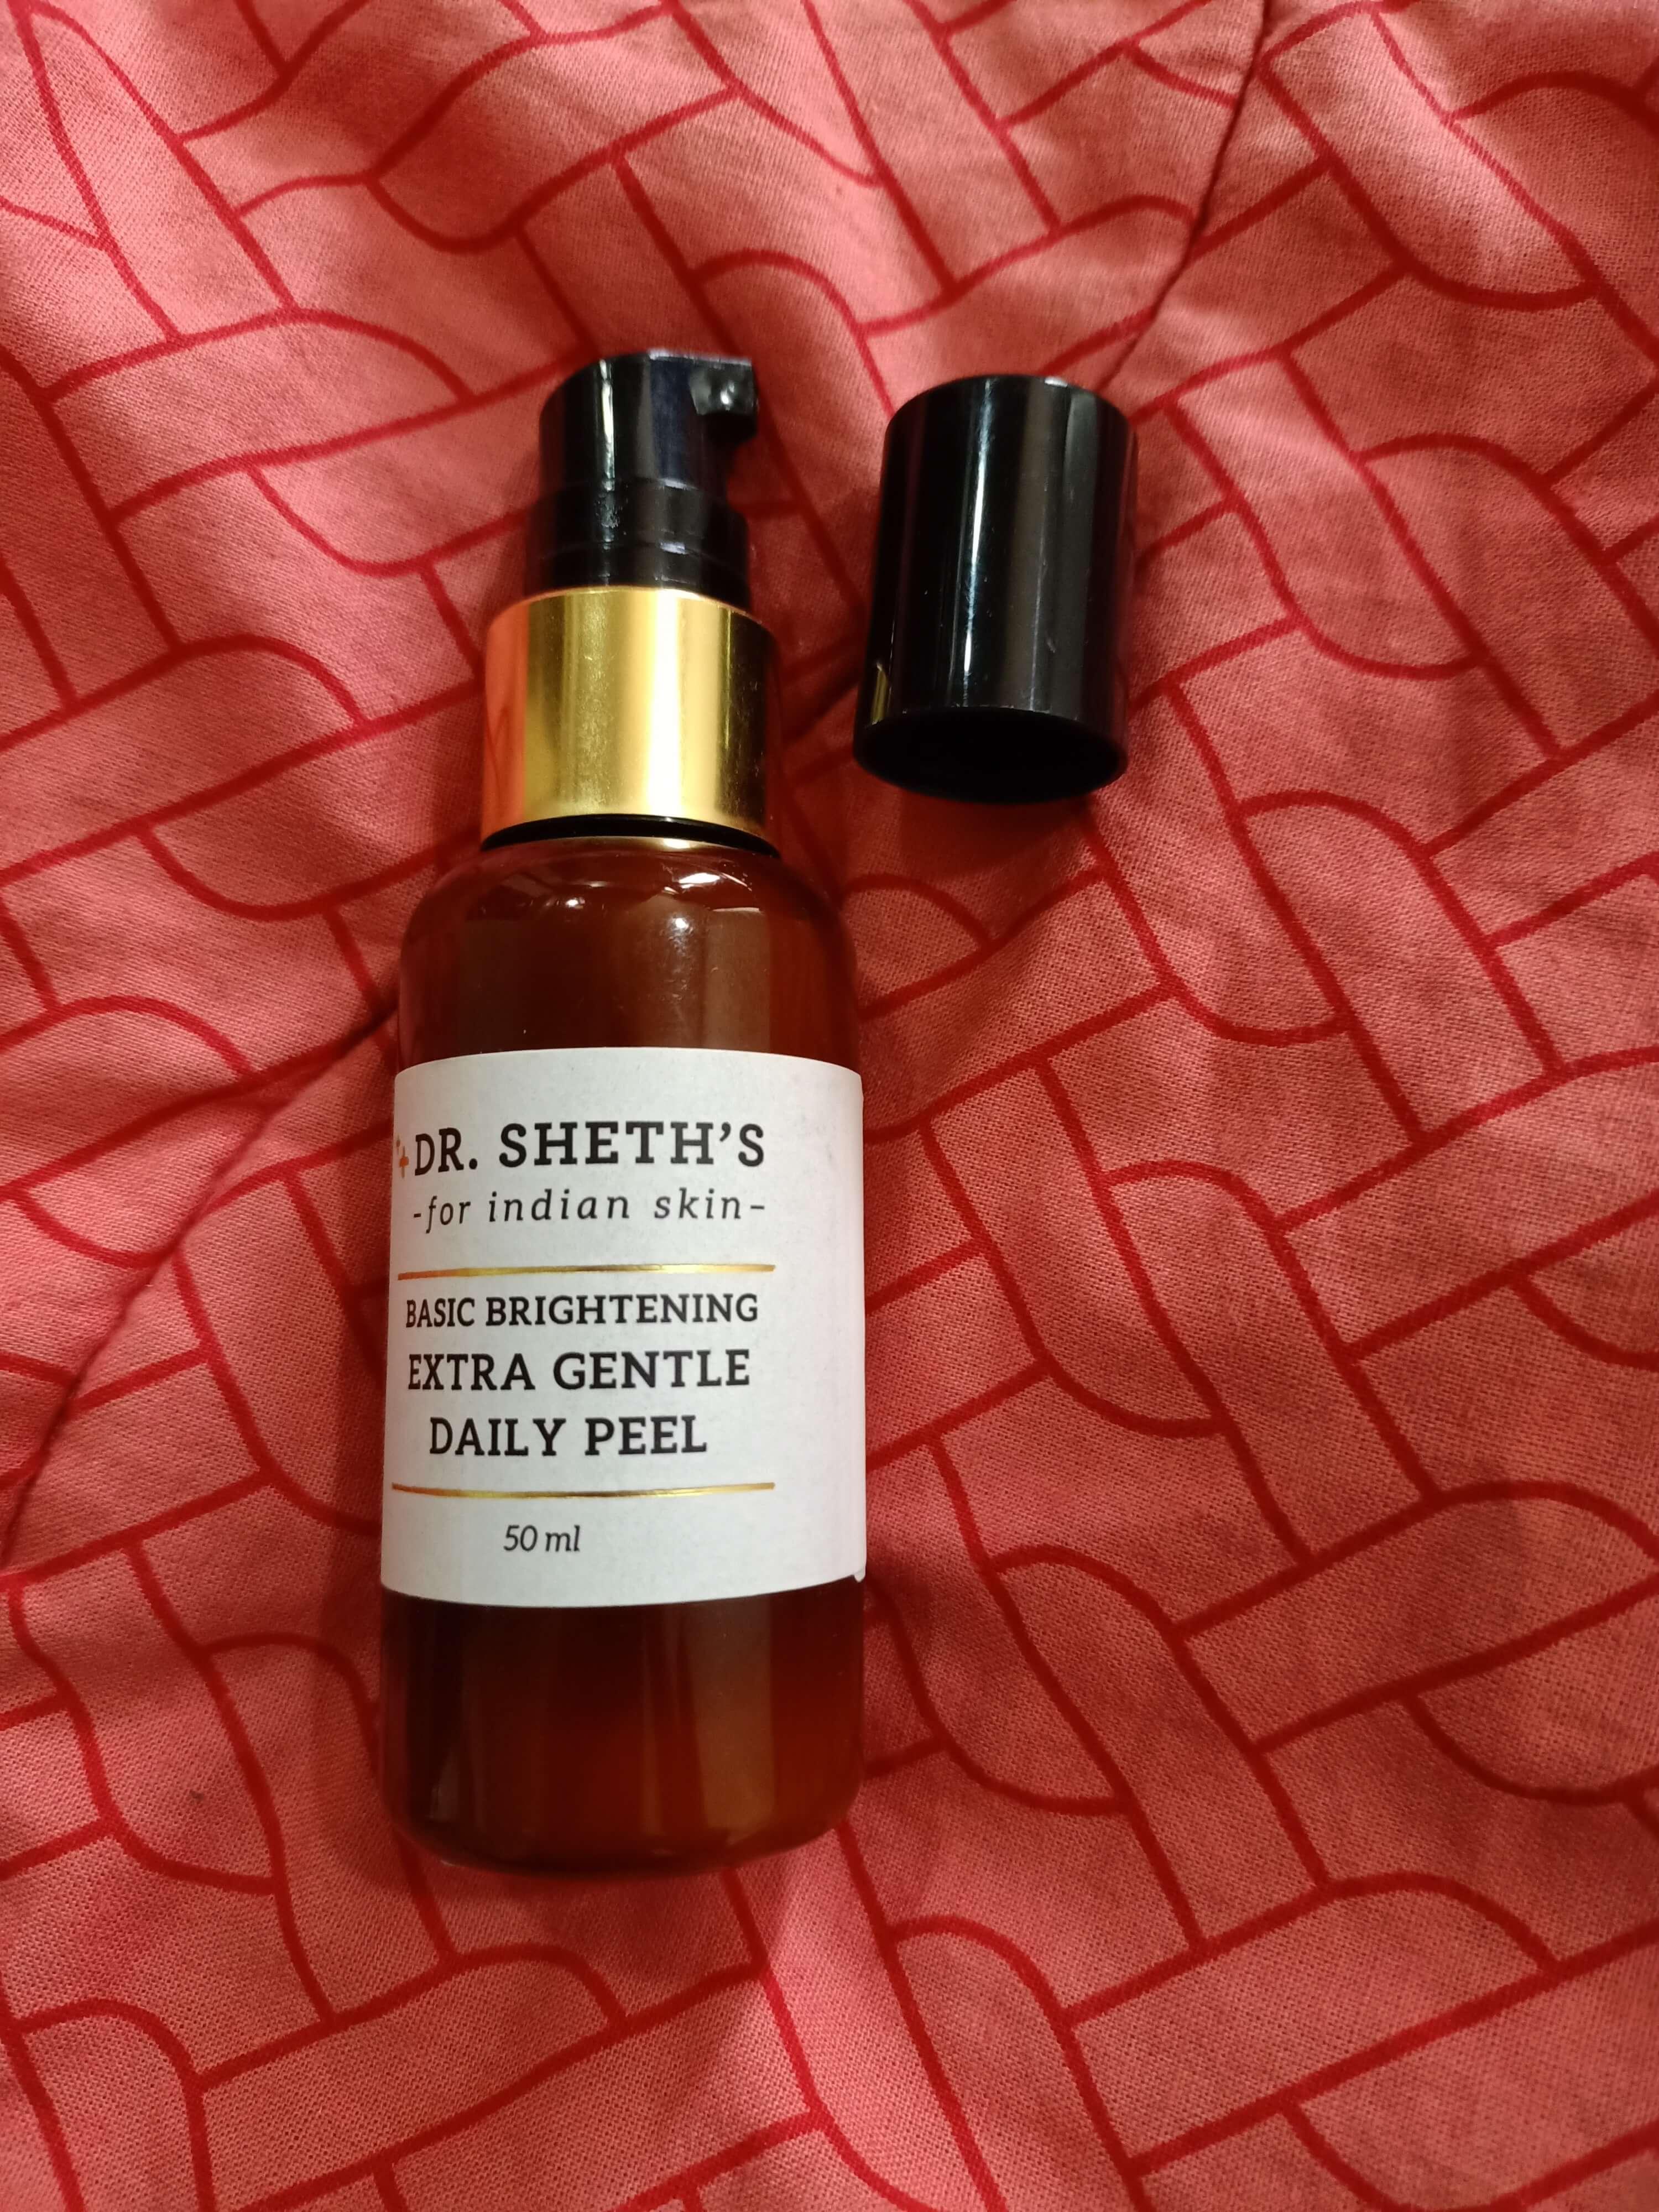 Dr. Sheth's Basic Brightening Extra Gentle Daily Peel pic 1-Dr. Sheth Basic Brightening Extra Gentle Daily Peel- Made for Indians by an Indian.-By avibeeswaxx